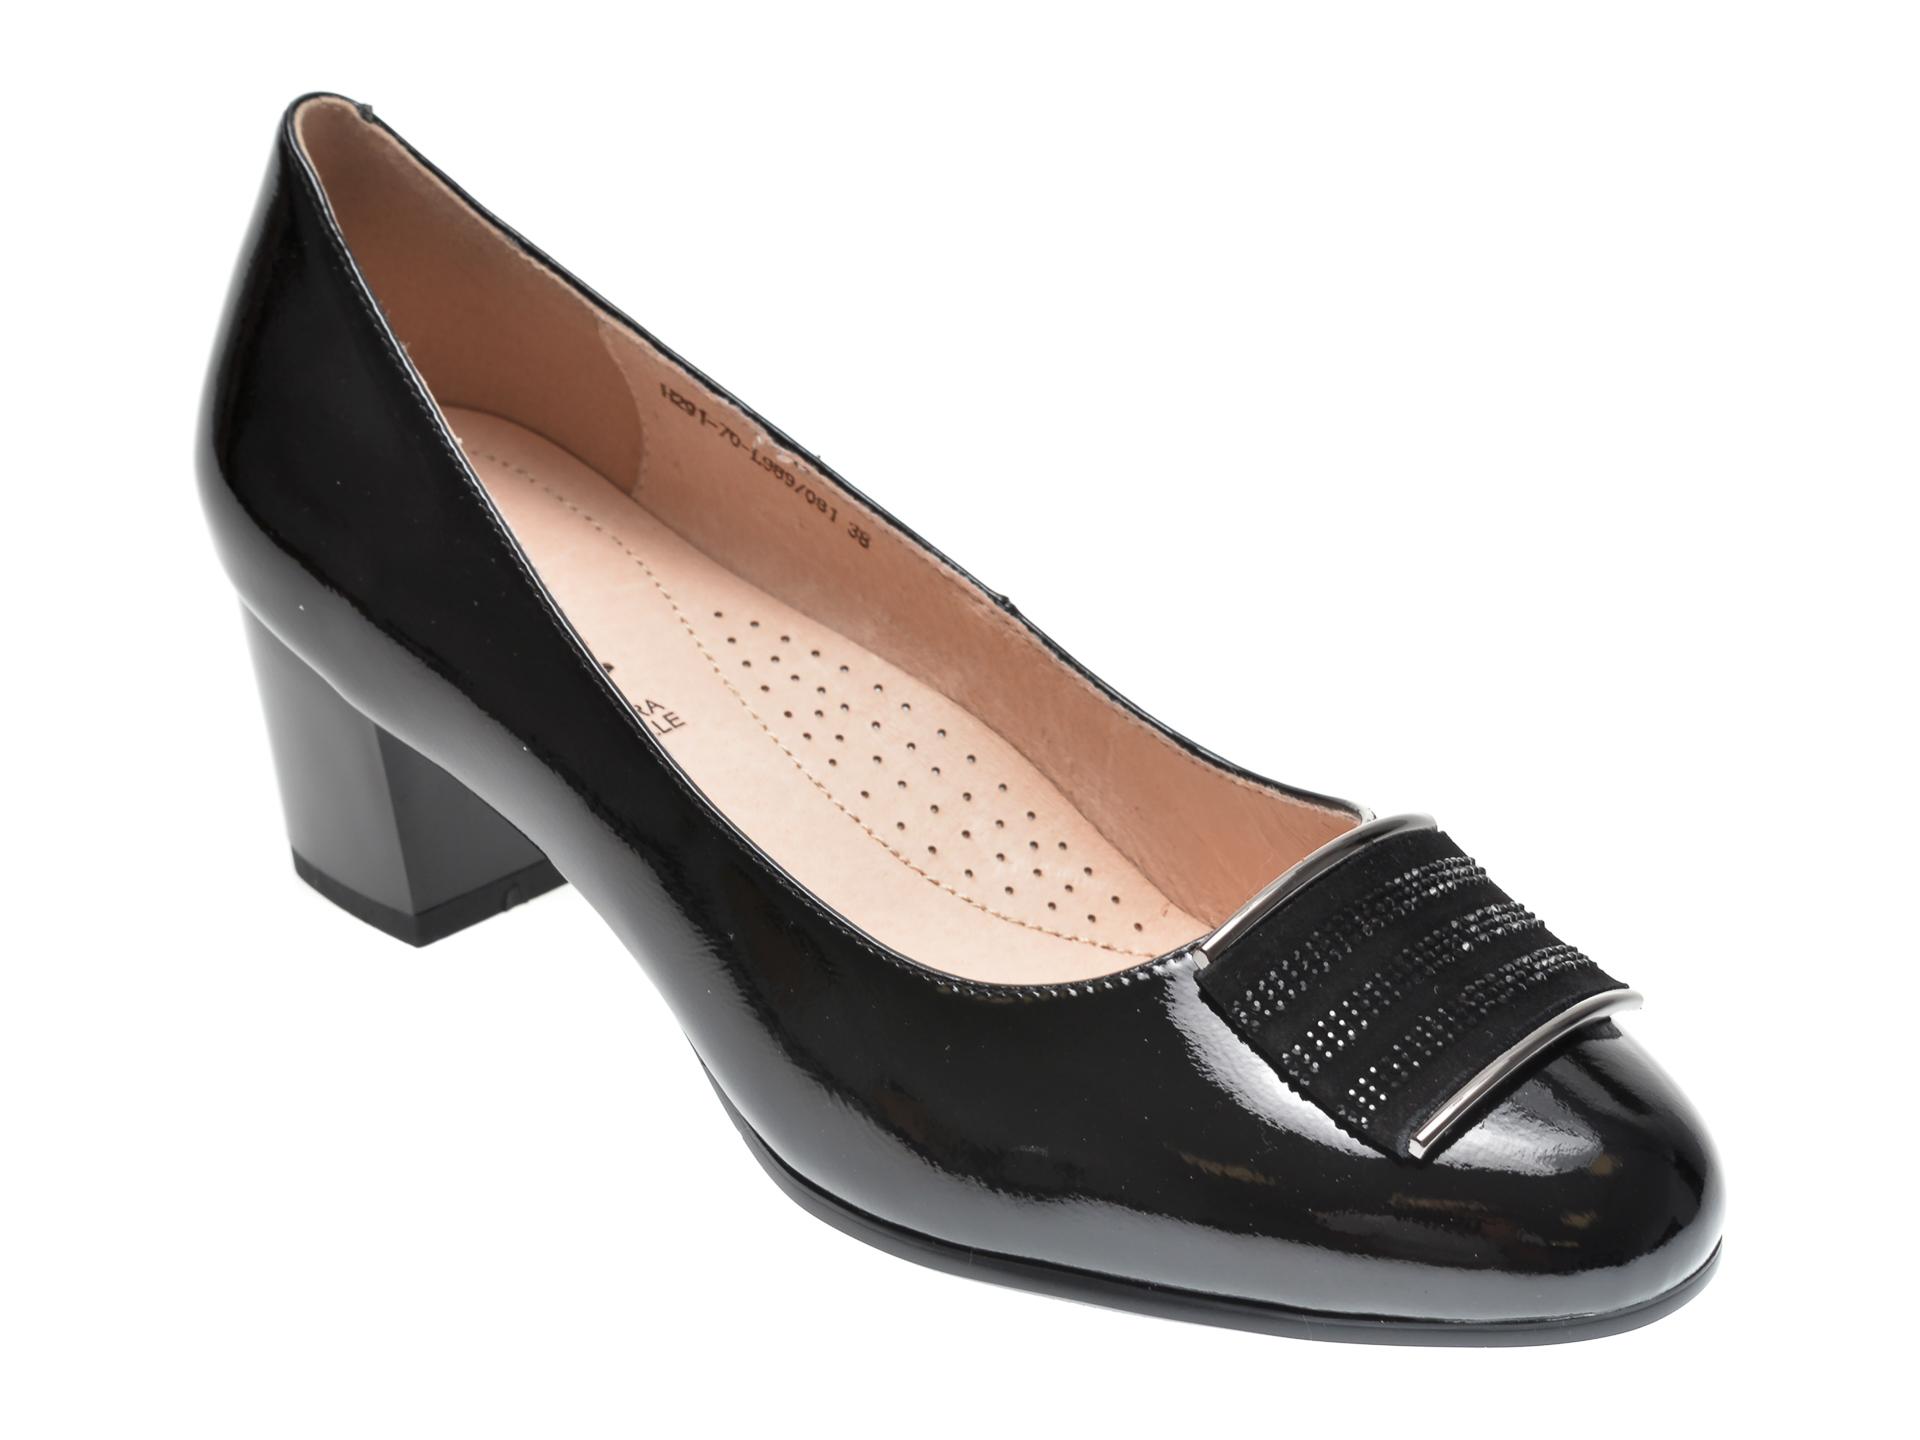 Pantofi Karisma Negri, H29170, Din Piele Naturala Lacuita